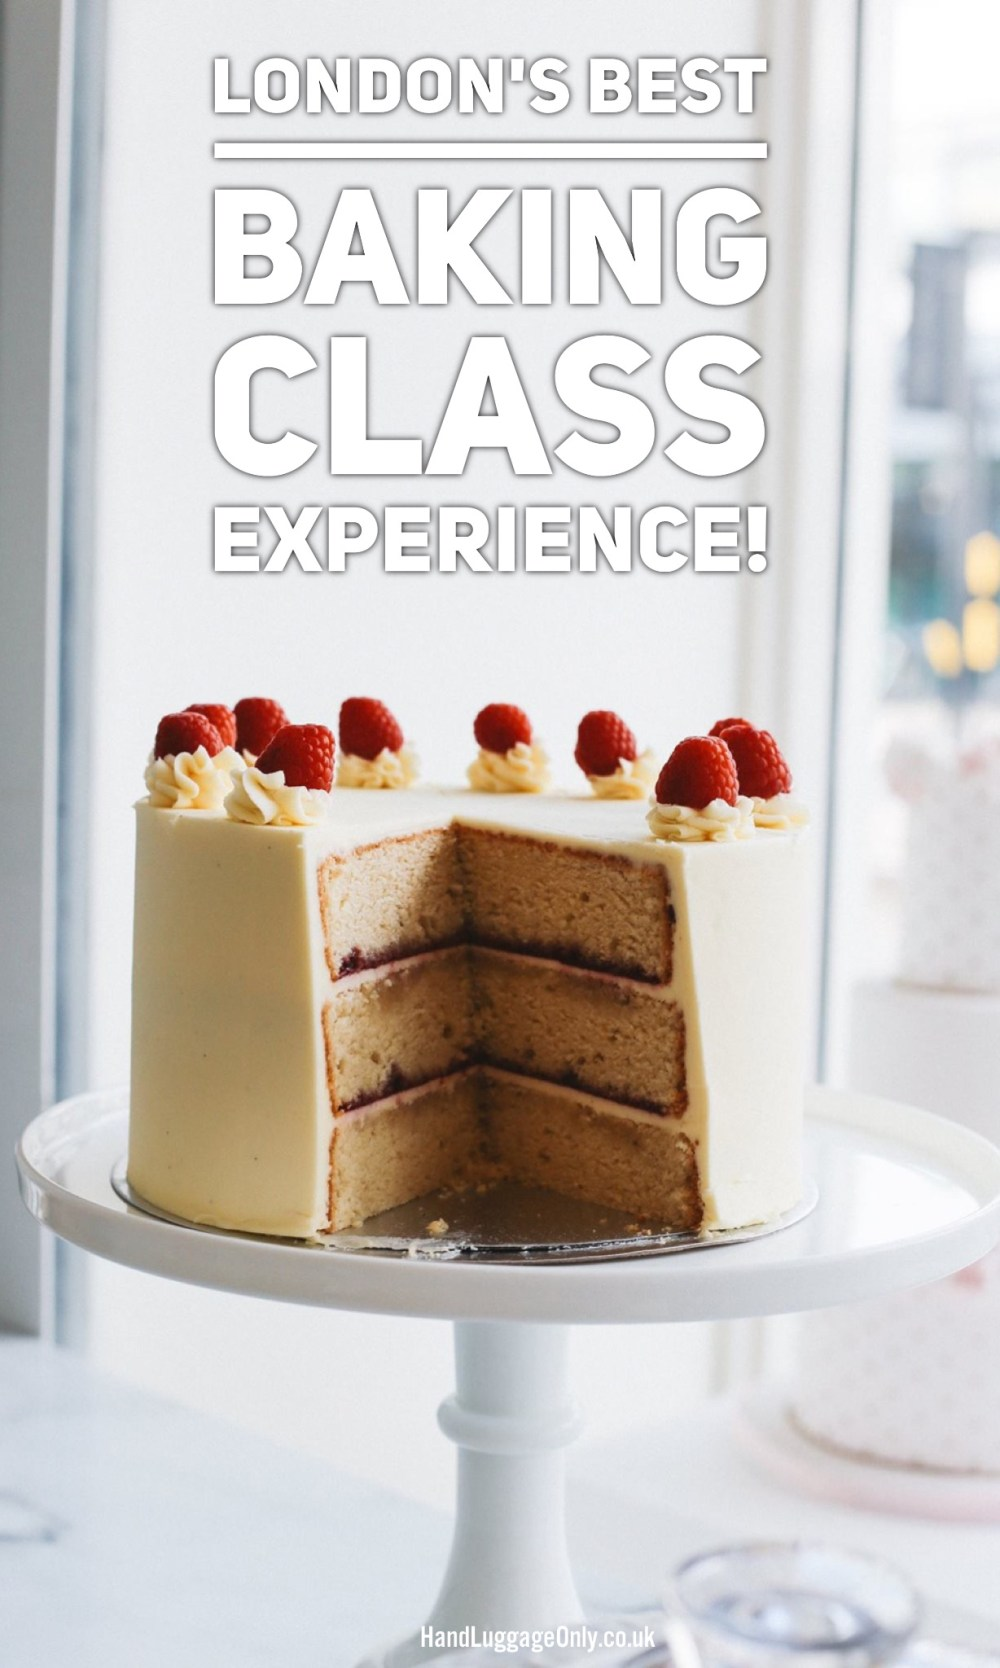 Baking Class Madeline's Cake Boutique London Richmond (1)